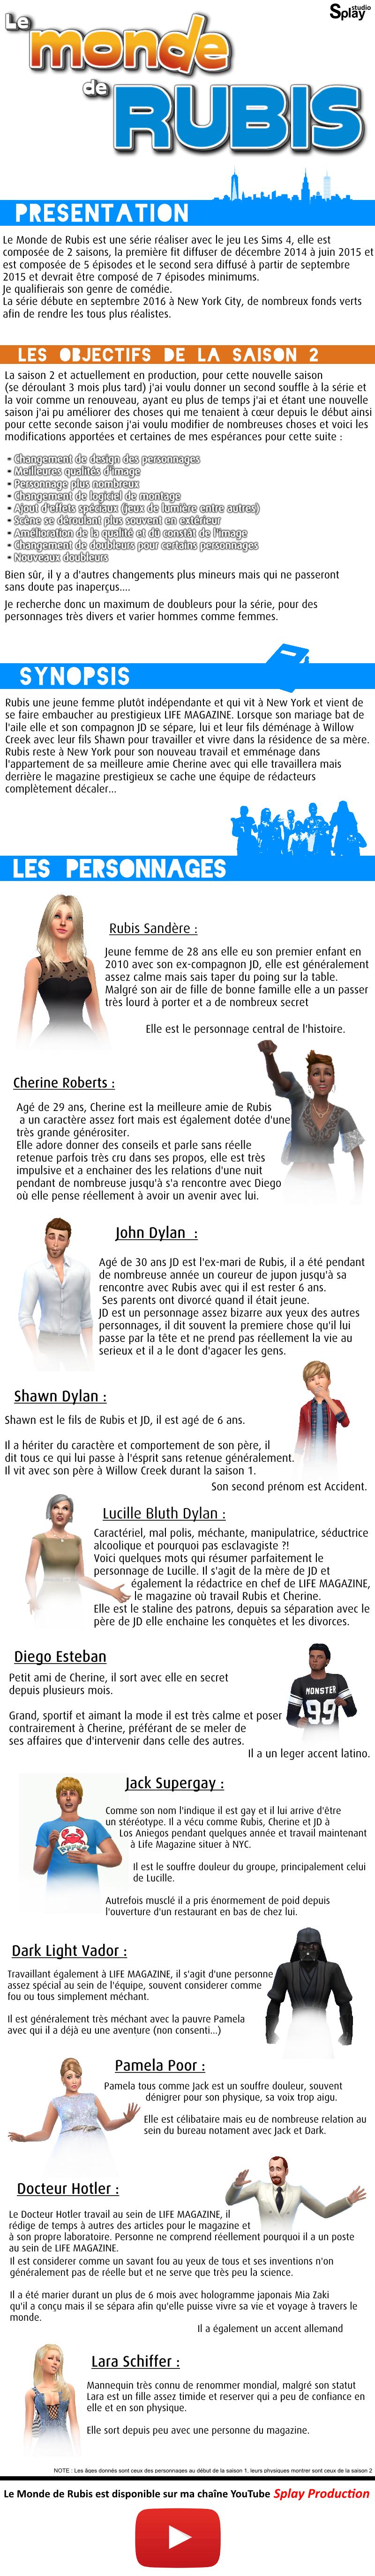 [Histoire] Le Monde de Rubis 592534383643Presentationdelaserie